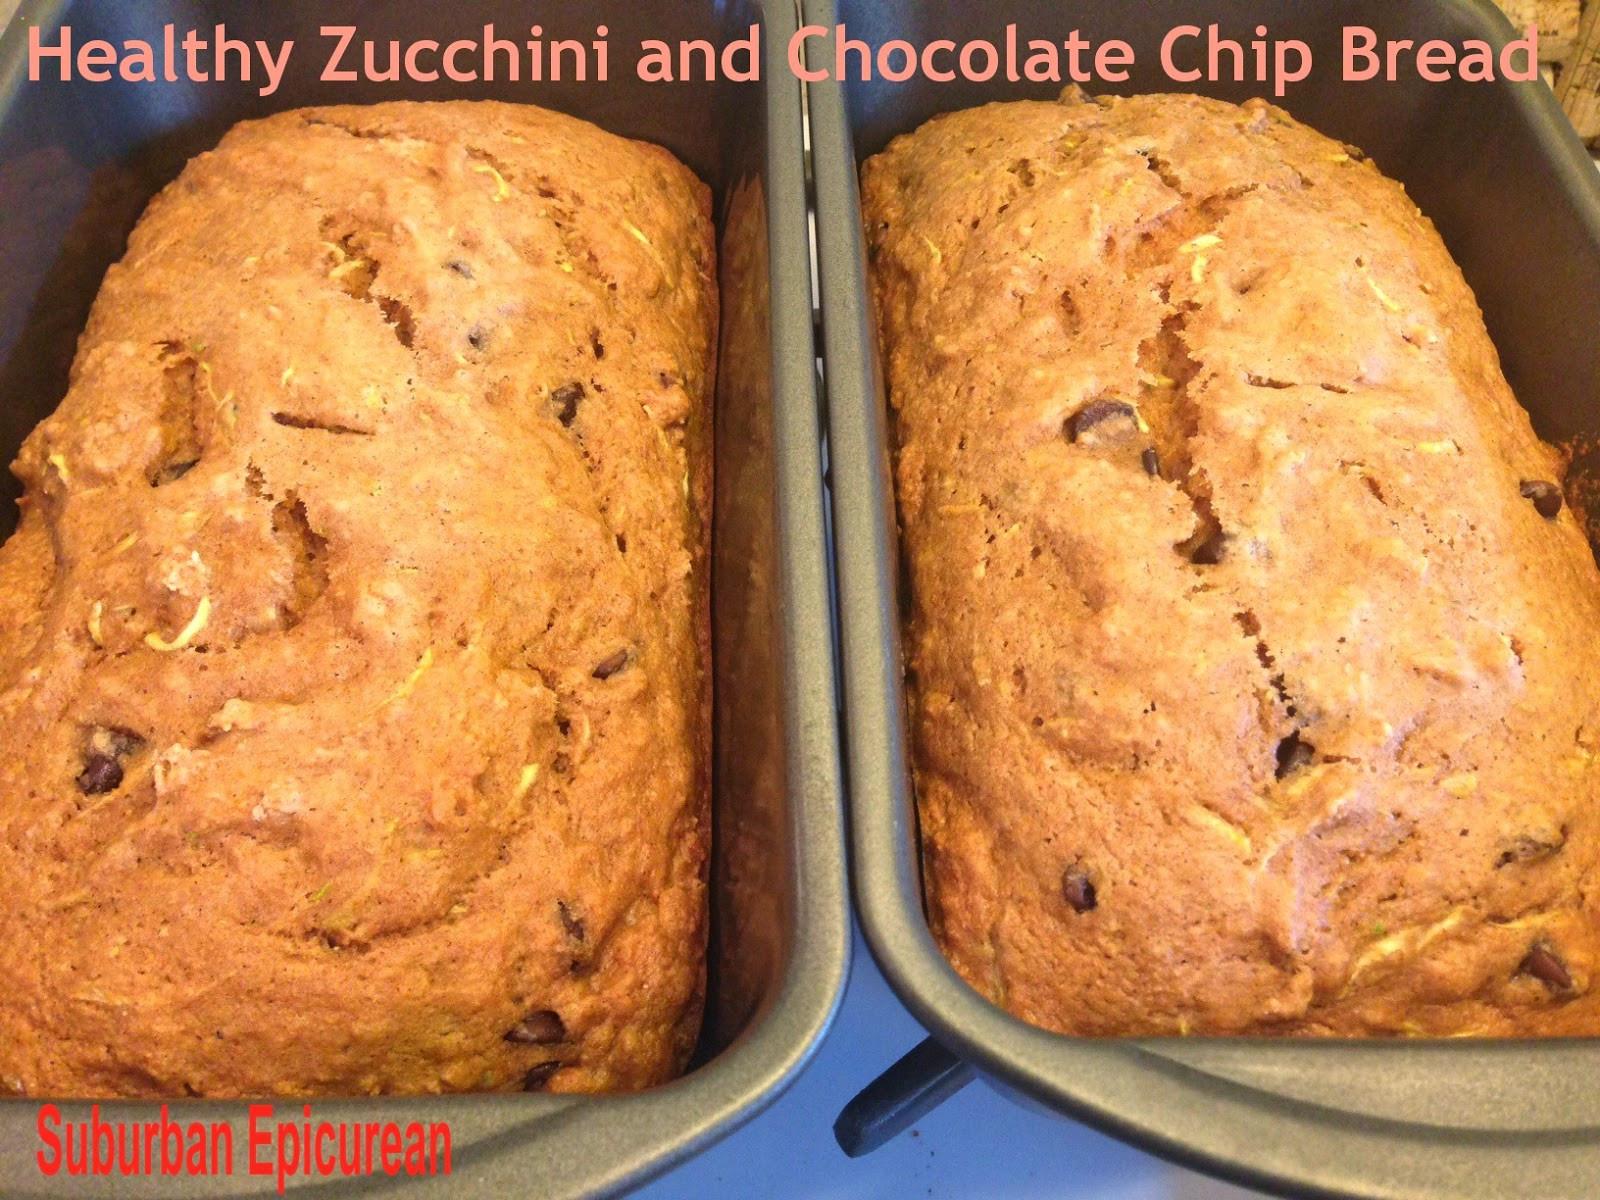 Healthy Chocolate Zucchini Bread  Suburban Epicurean Healthy Chocolate Chip Zucchini Bread